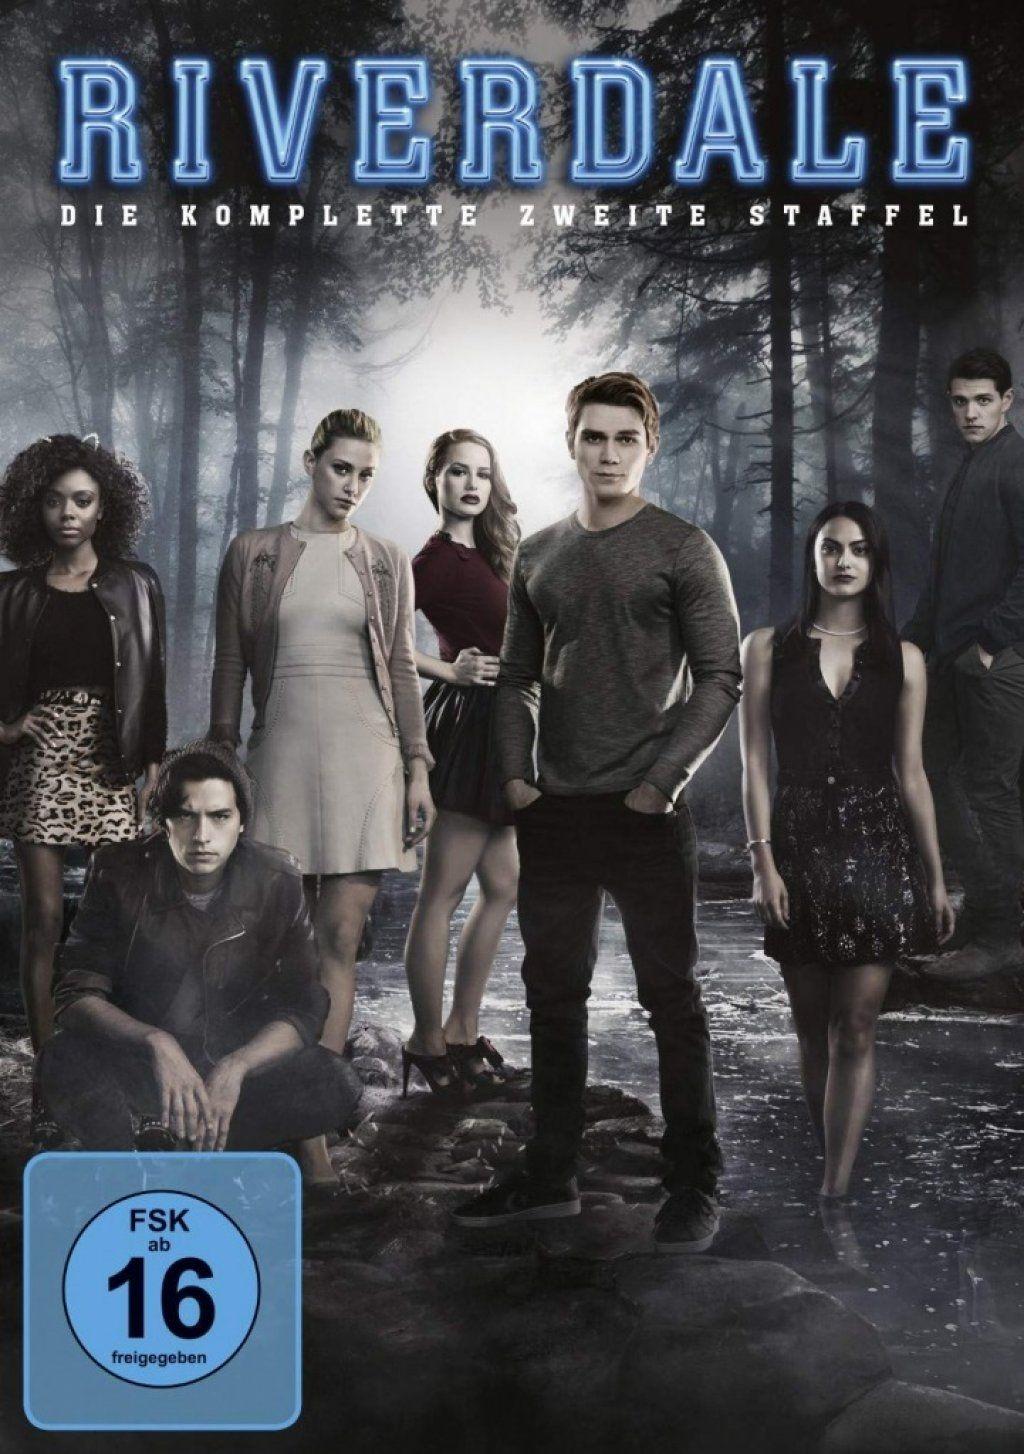 Riverdale - Staffel 2 (4 Discs)